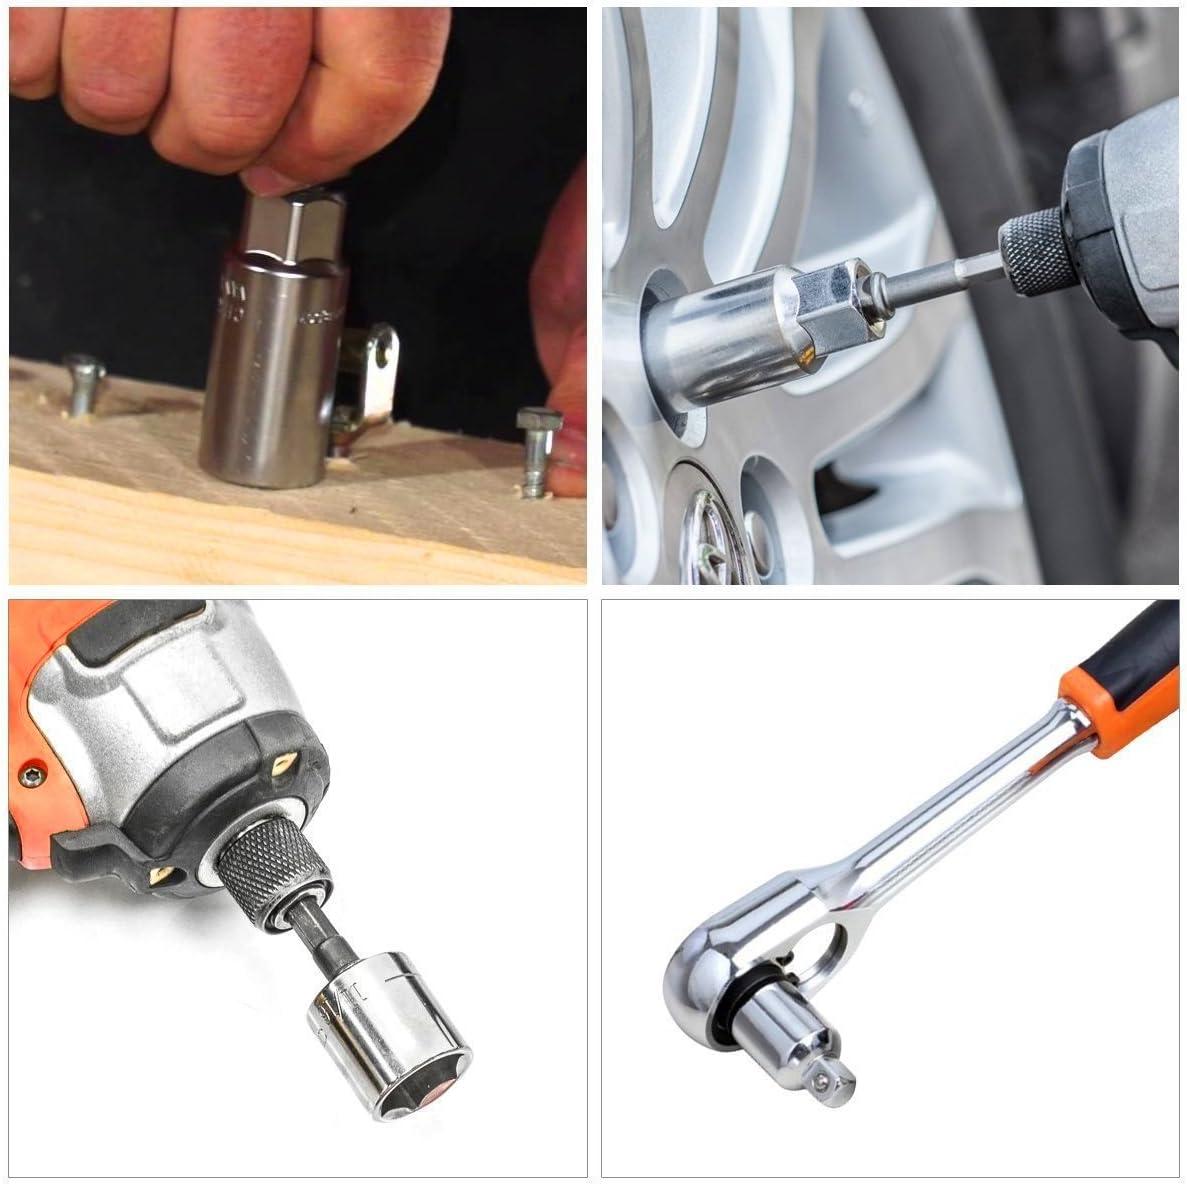 Newder Impact Grade Power Hand Tools Driver Sockets Adapter Extension Set,4Pcs Drive Socket Adapter Converter Reducer Air Impact Socket Wrench Set+3pc 1//4 3//8 1//2 Hex Shank Drill Nut Driver Bit Set